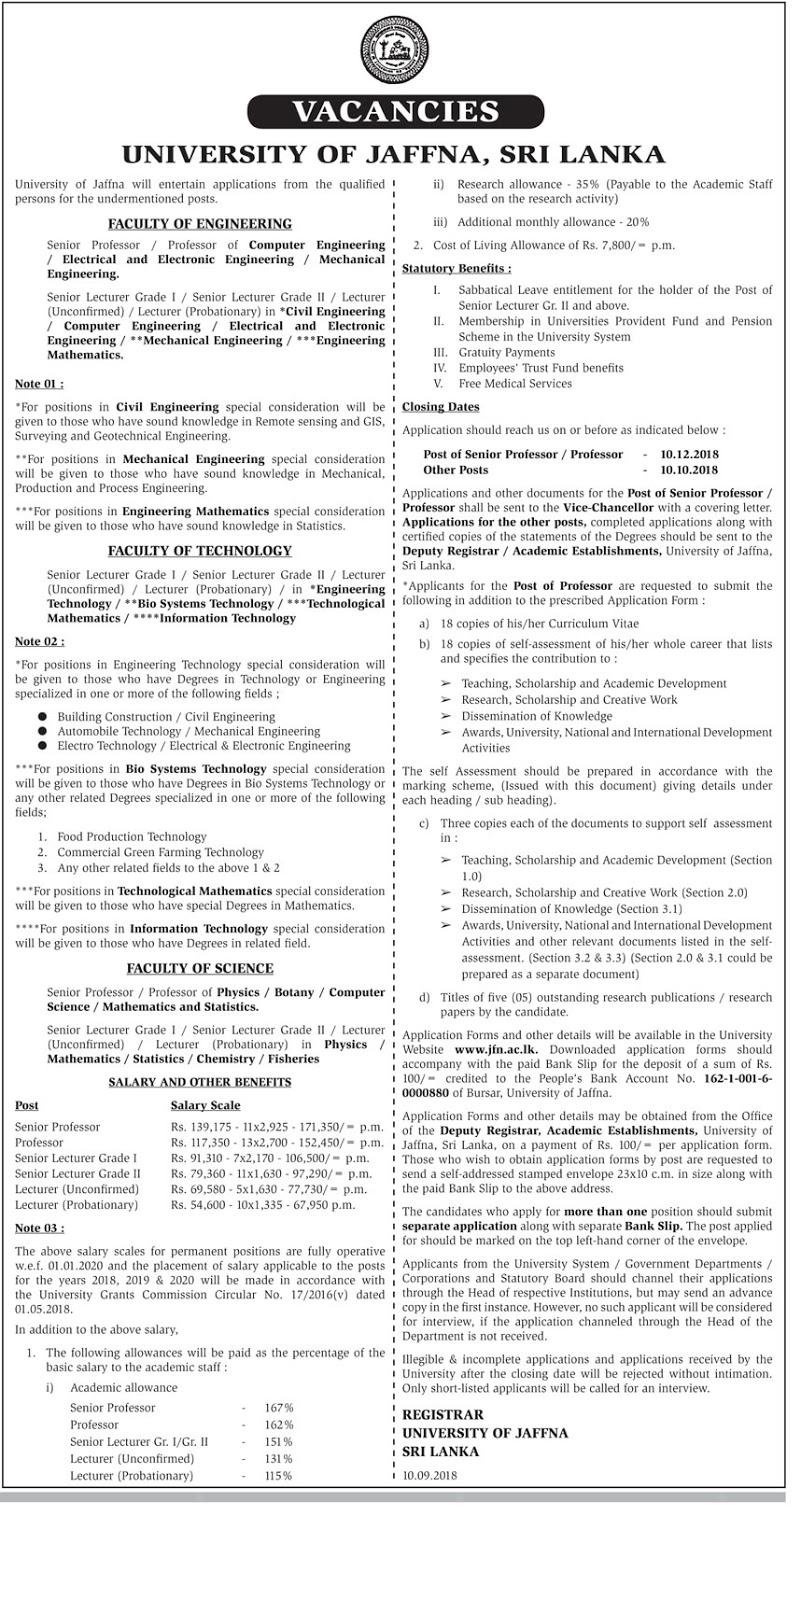 Vacancies - University of Jaffna - Government jobs in sri lanka